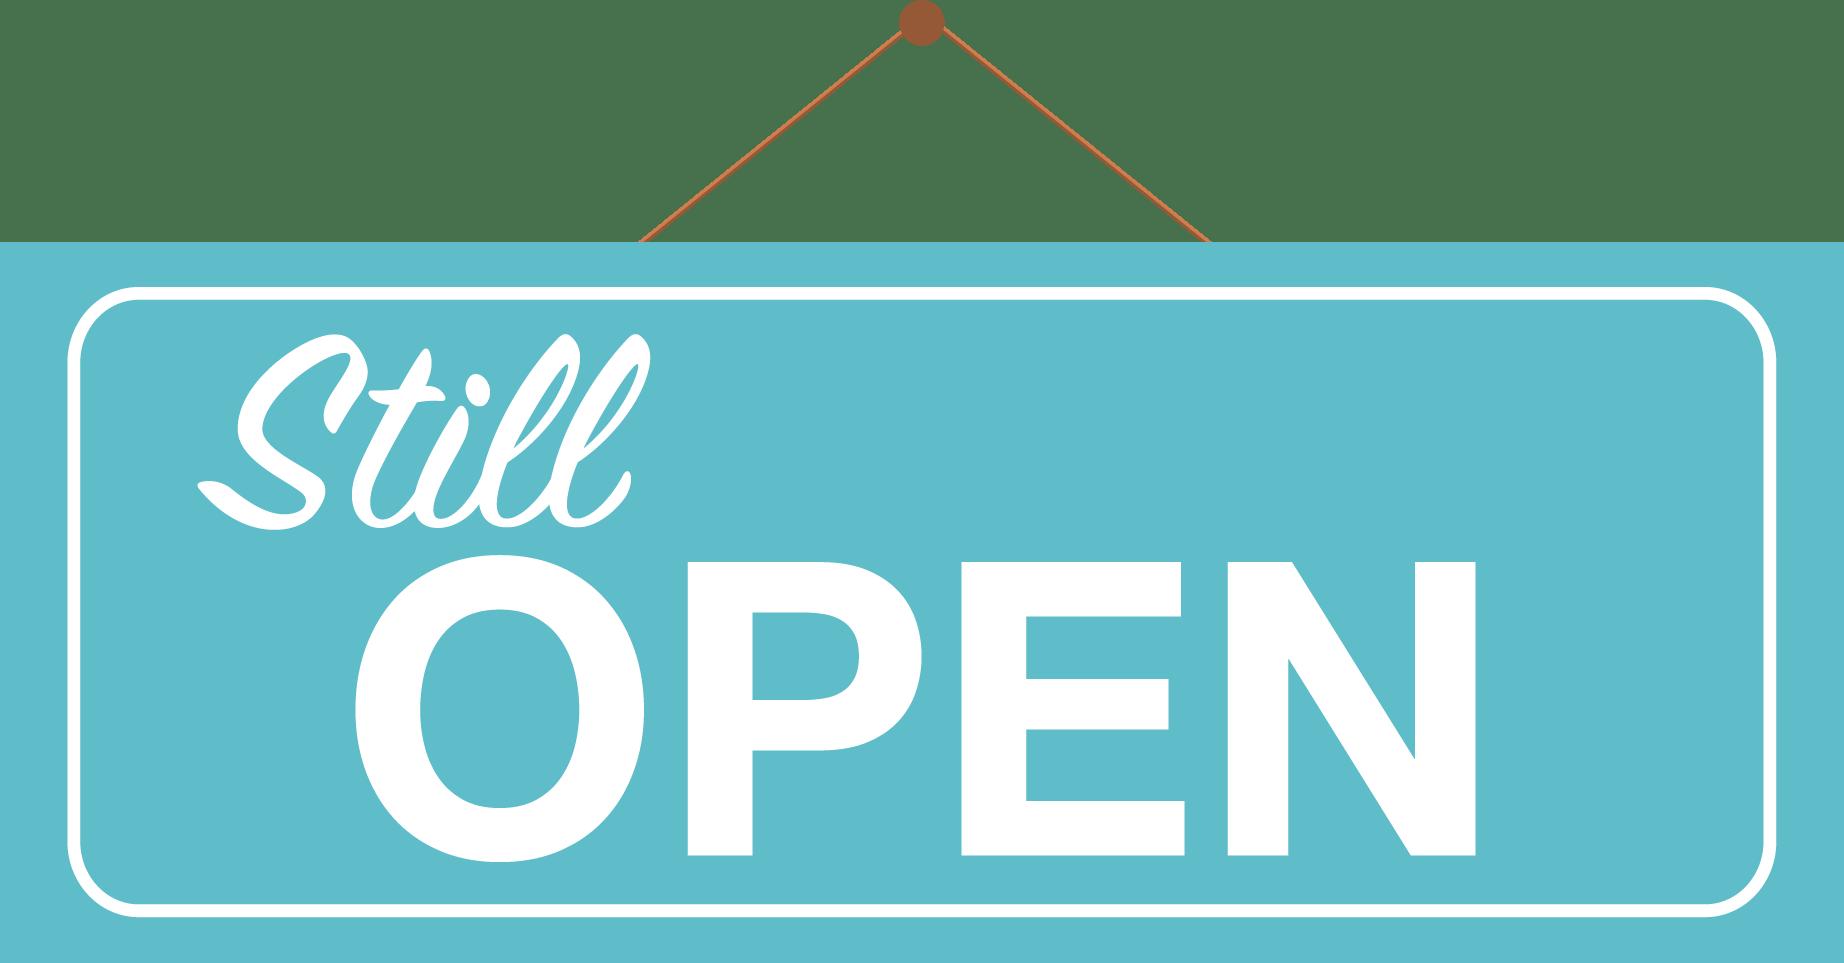 chiropractor still open in portland